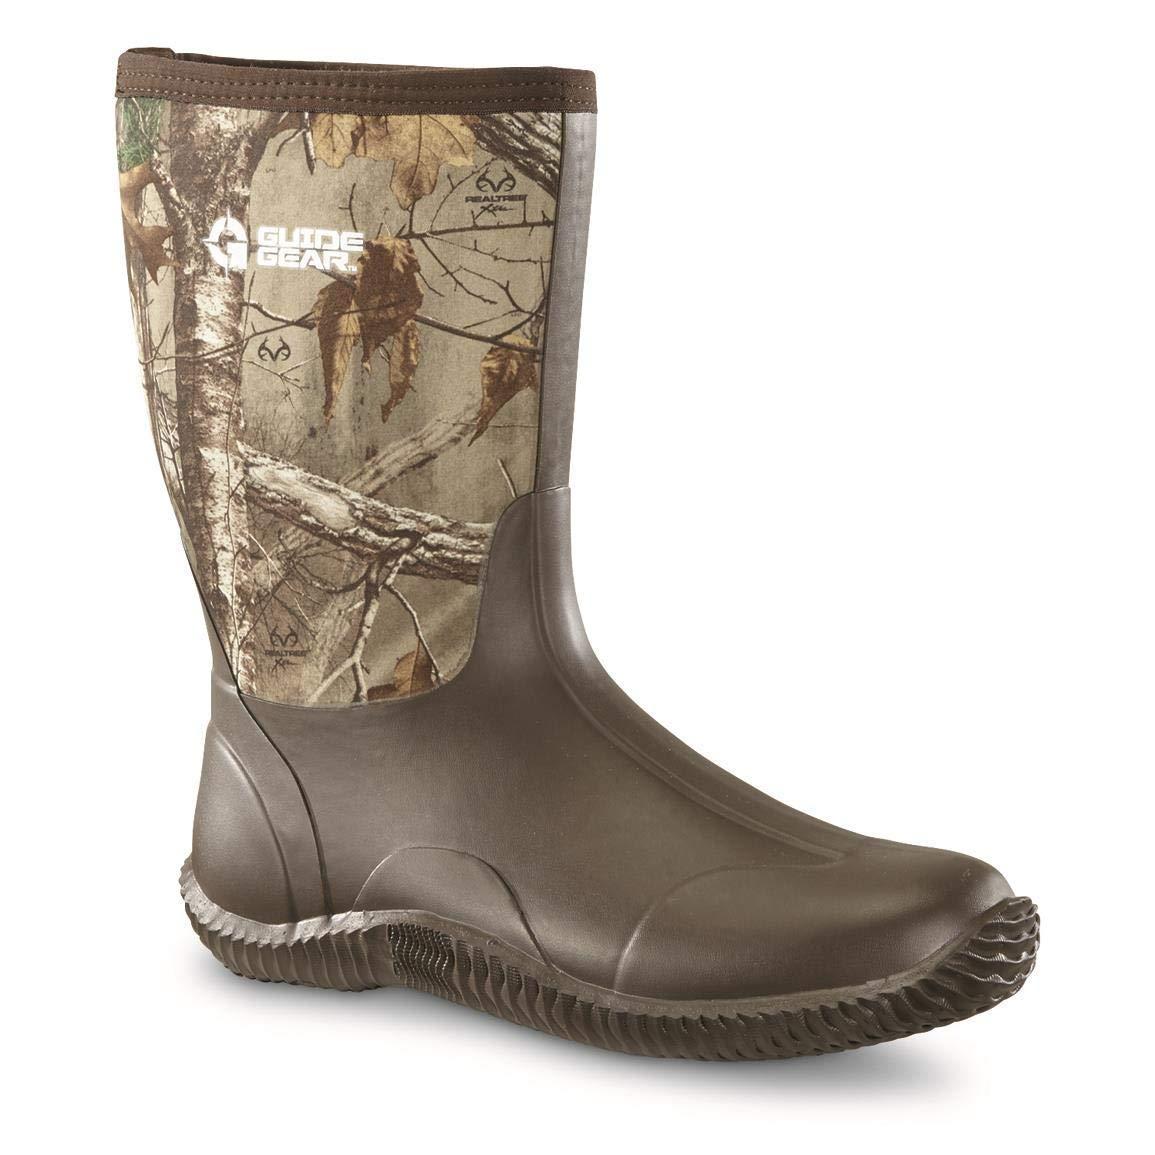 2e3e48014cf Cheap Pink Camo Rubber Boots, find Pink Camo Rubber Boots deals on ...